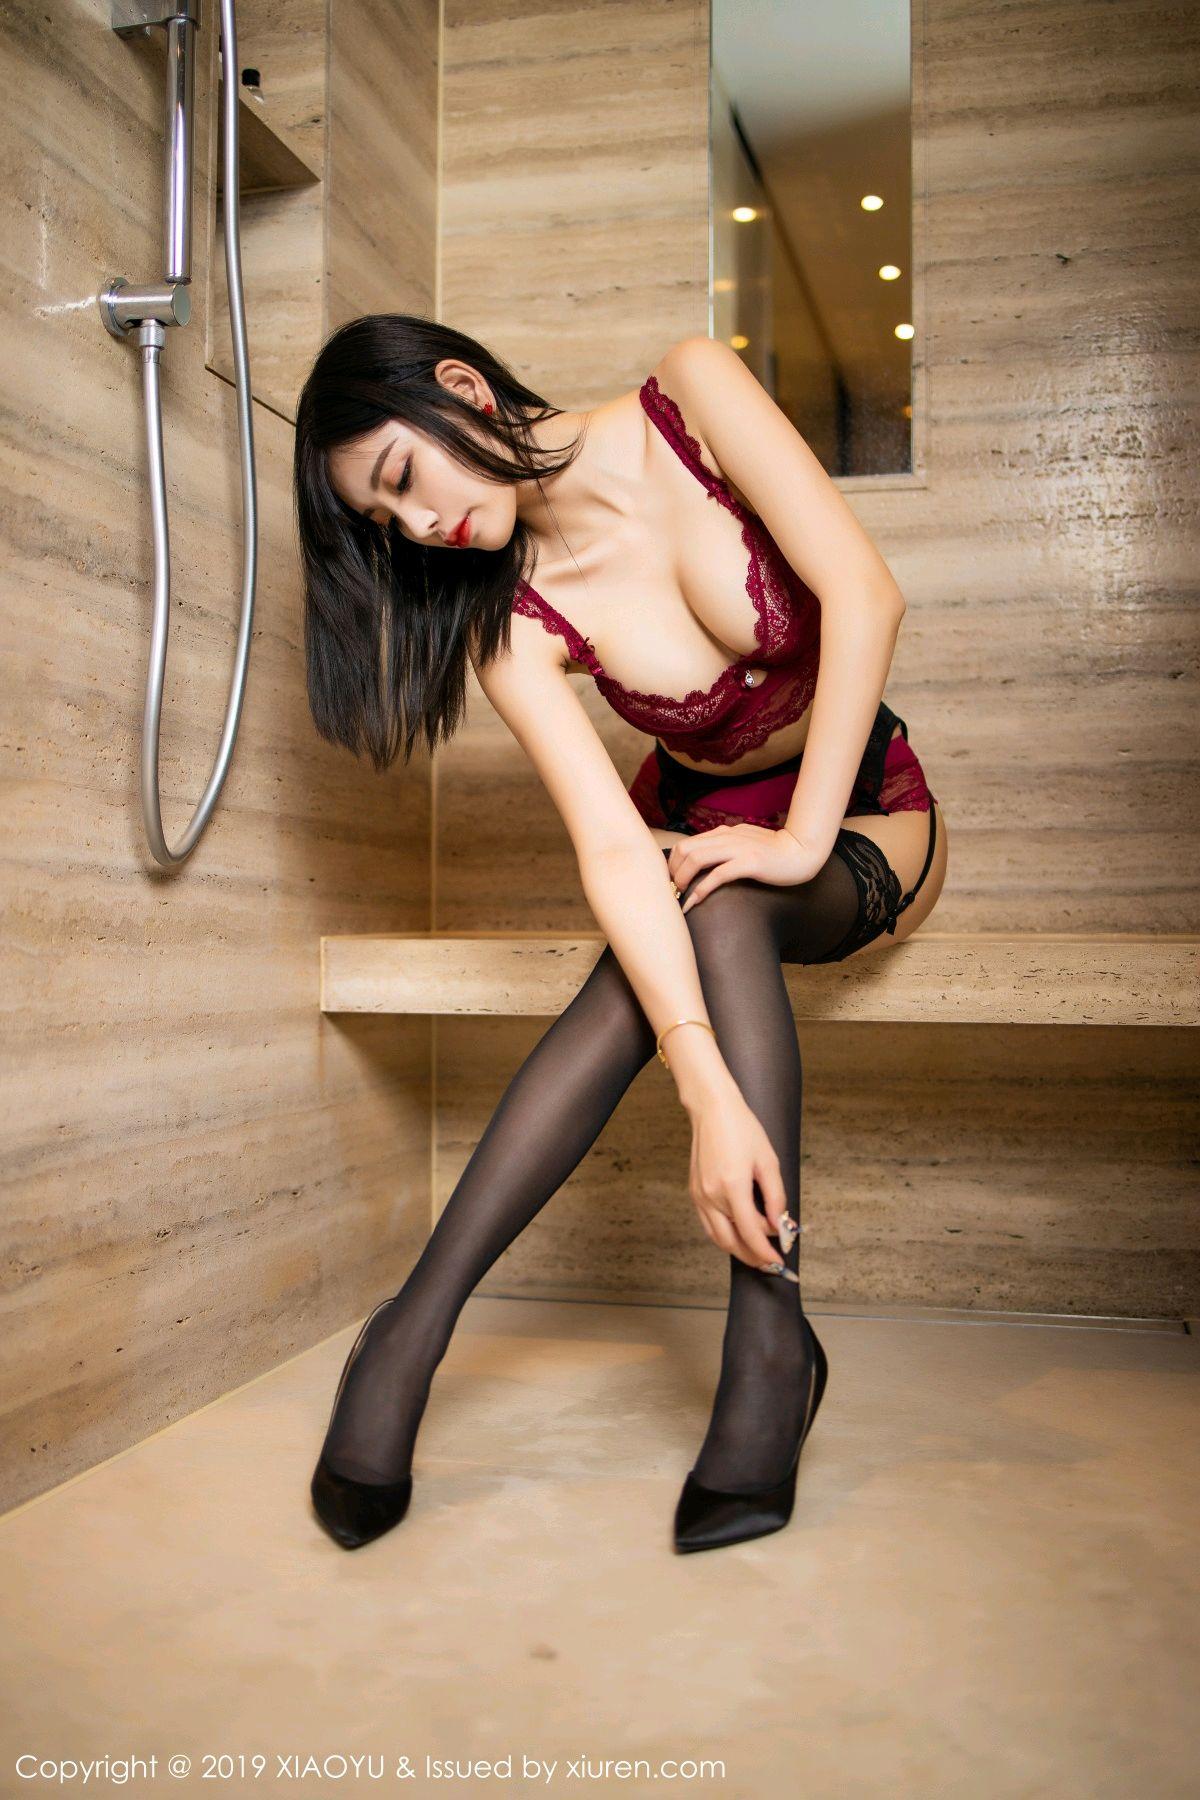 [XiaoYu] Vol.153 Yang Chen Chen 58P, Bathroom, Black Silk, Underwear, XiaoYu, Yang Chen Chen